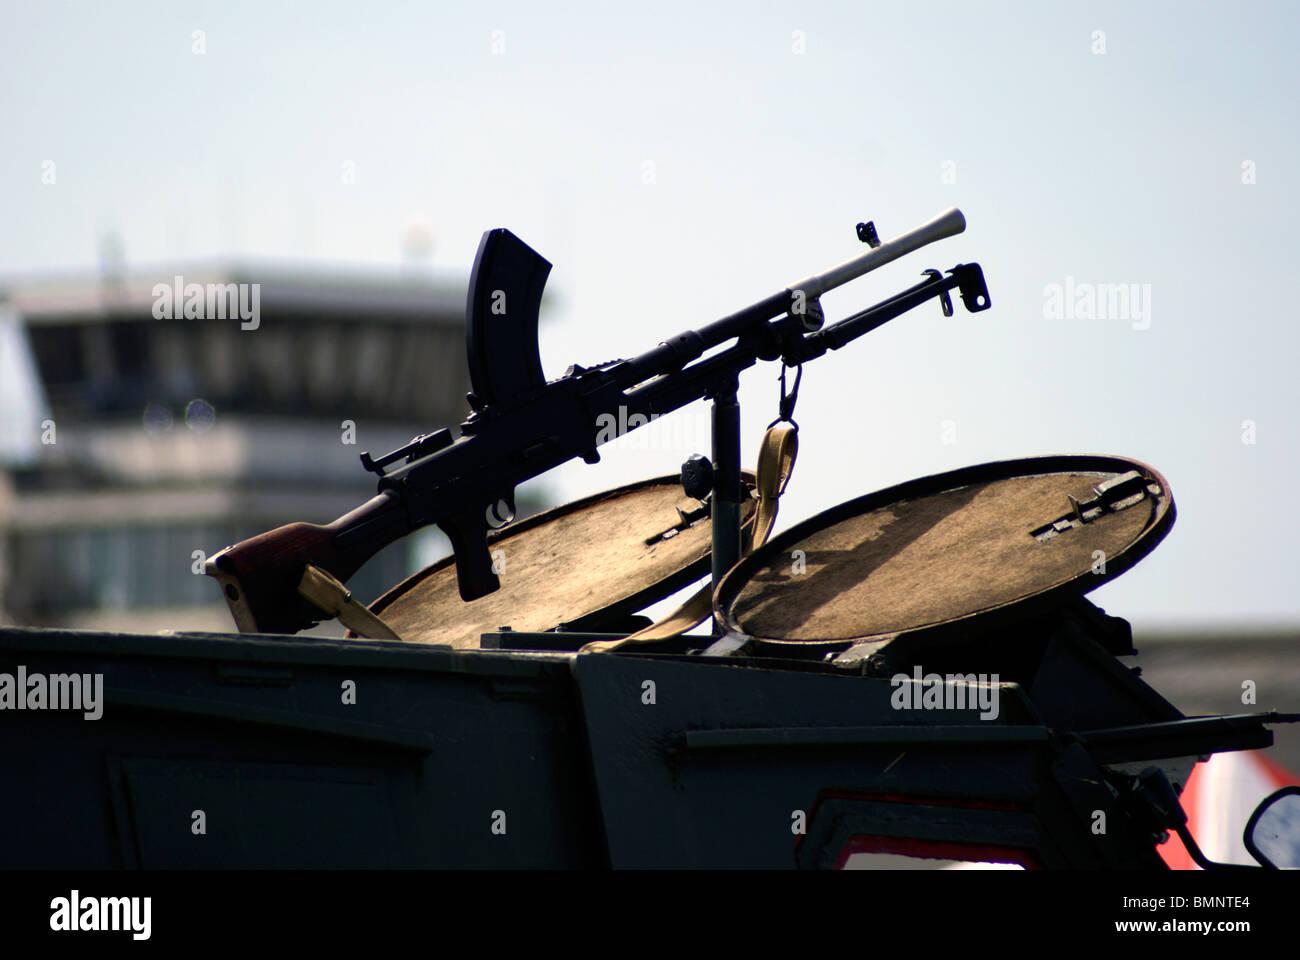 BREN GUN  303, LIGHT MACHINE GUN, LMG Stock Photo: 29983692 - Alamy